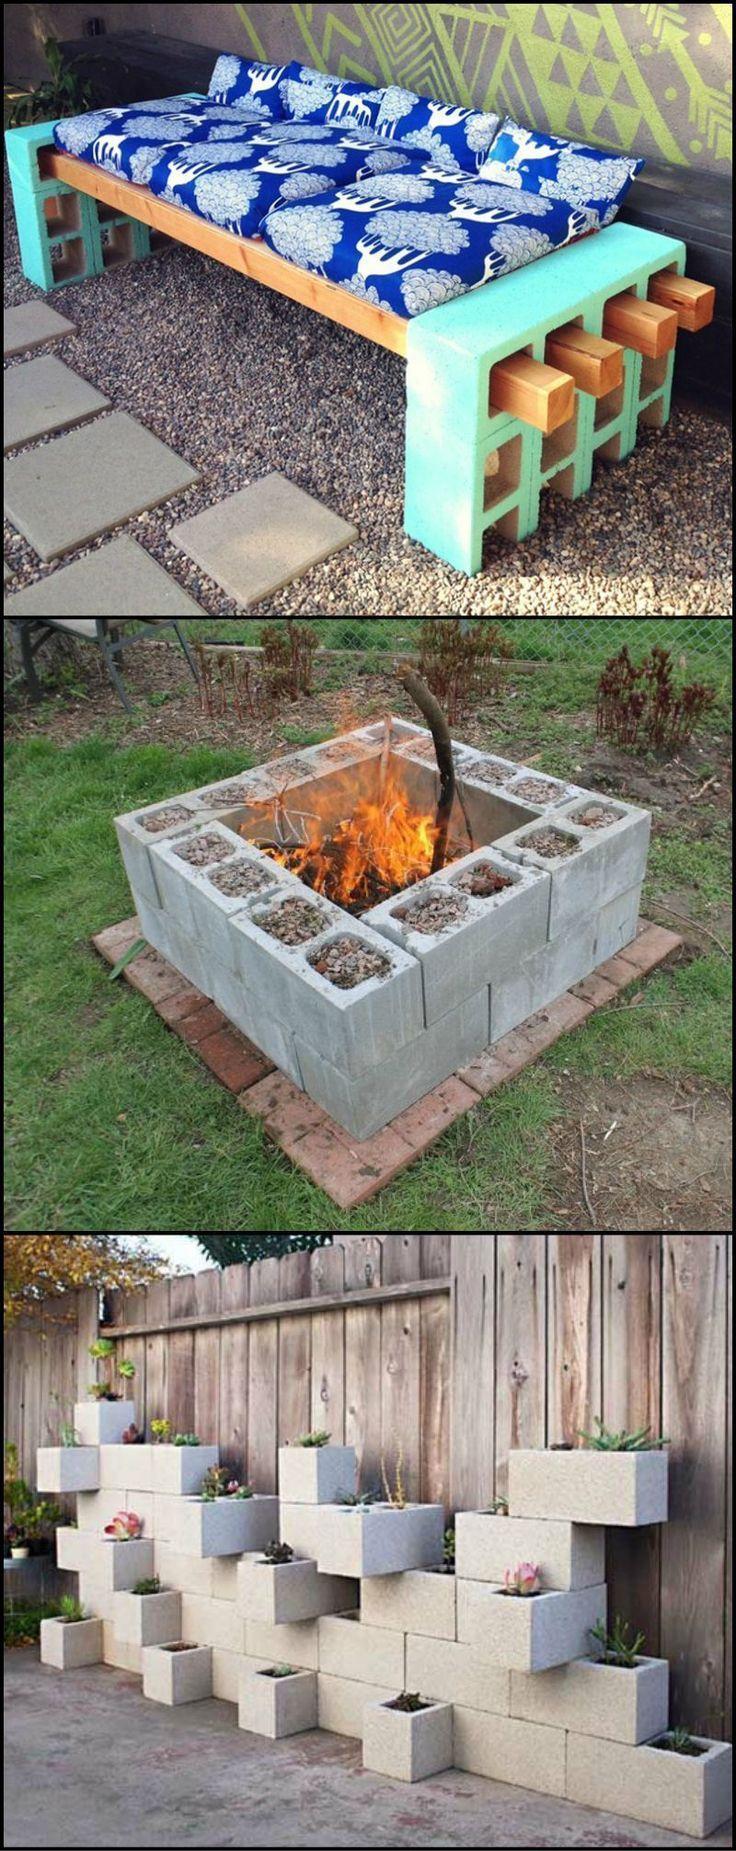 More ideas below: DIY Square Round cinder block fire pit ... on Cinder Block Fireplace Diy id=56876